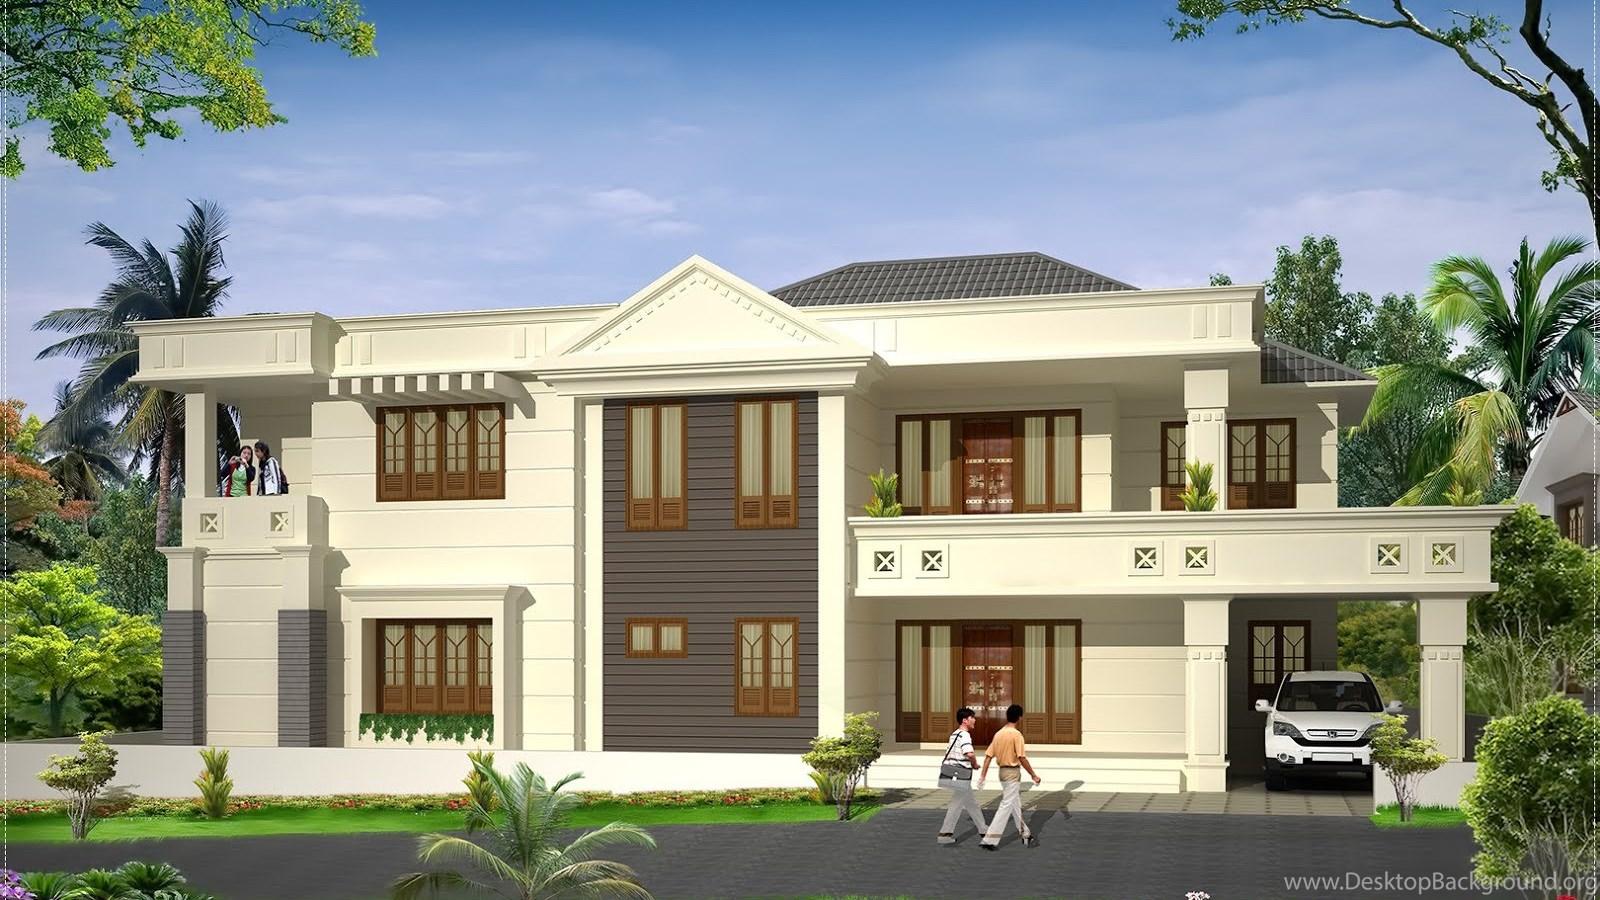 Modern Luxury Home Designs 010315 10395 Wallpapers Free Hd Modern ... Desktop  Background